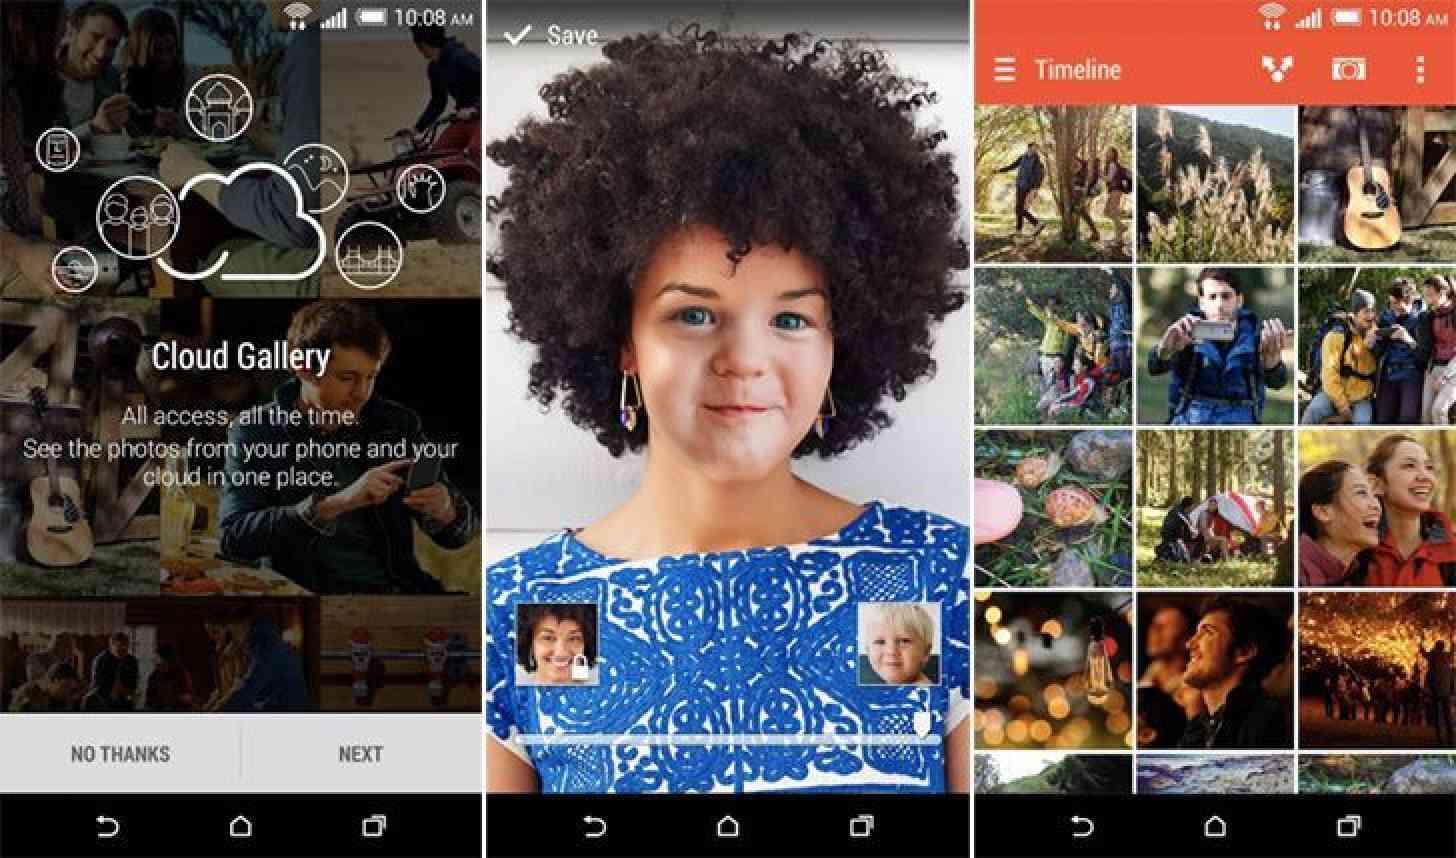 HTC Gallery app screenshots